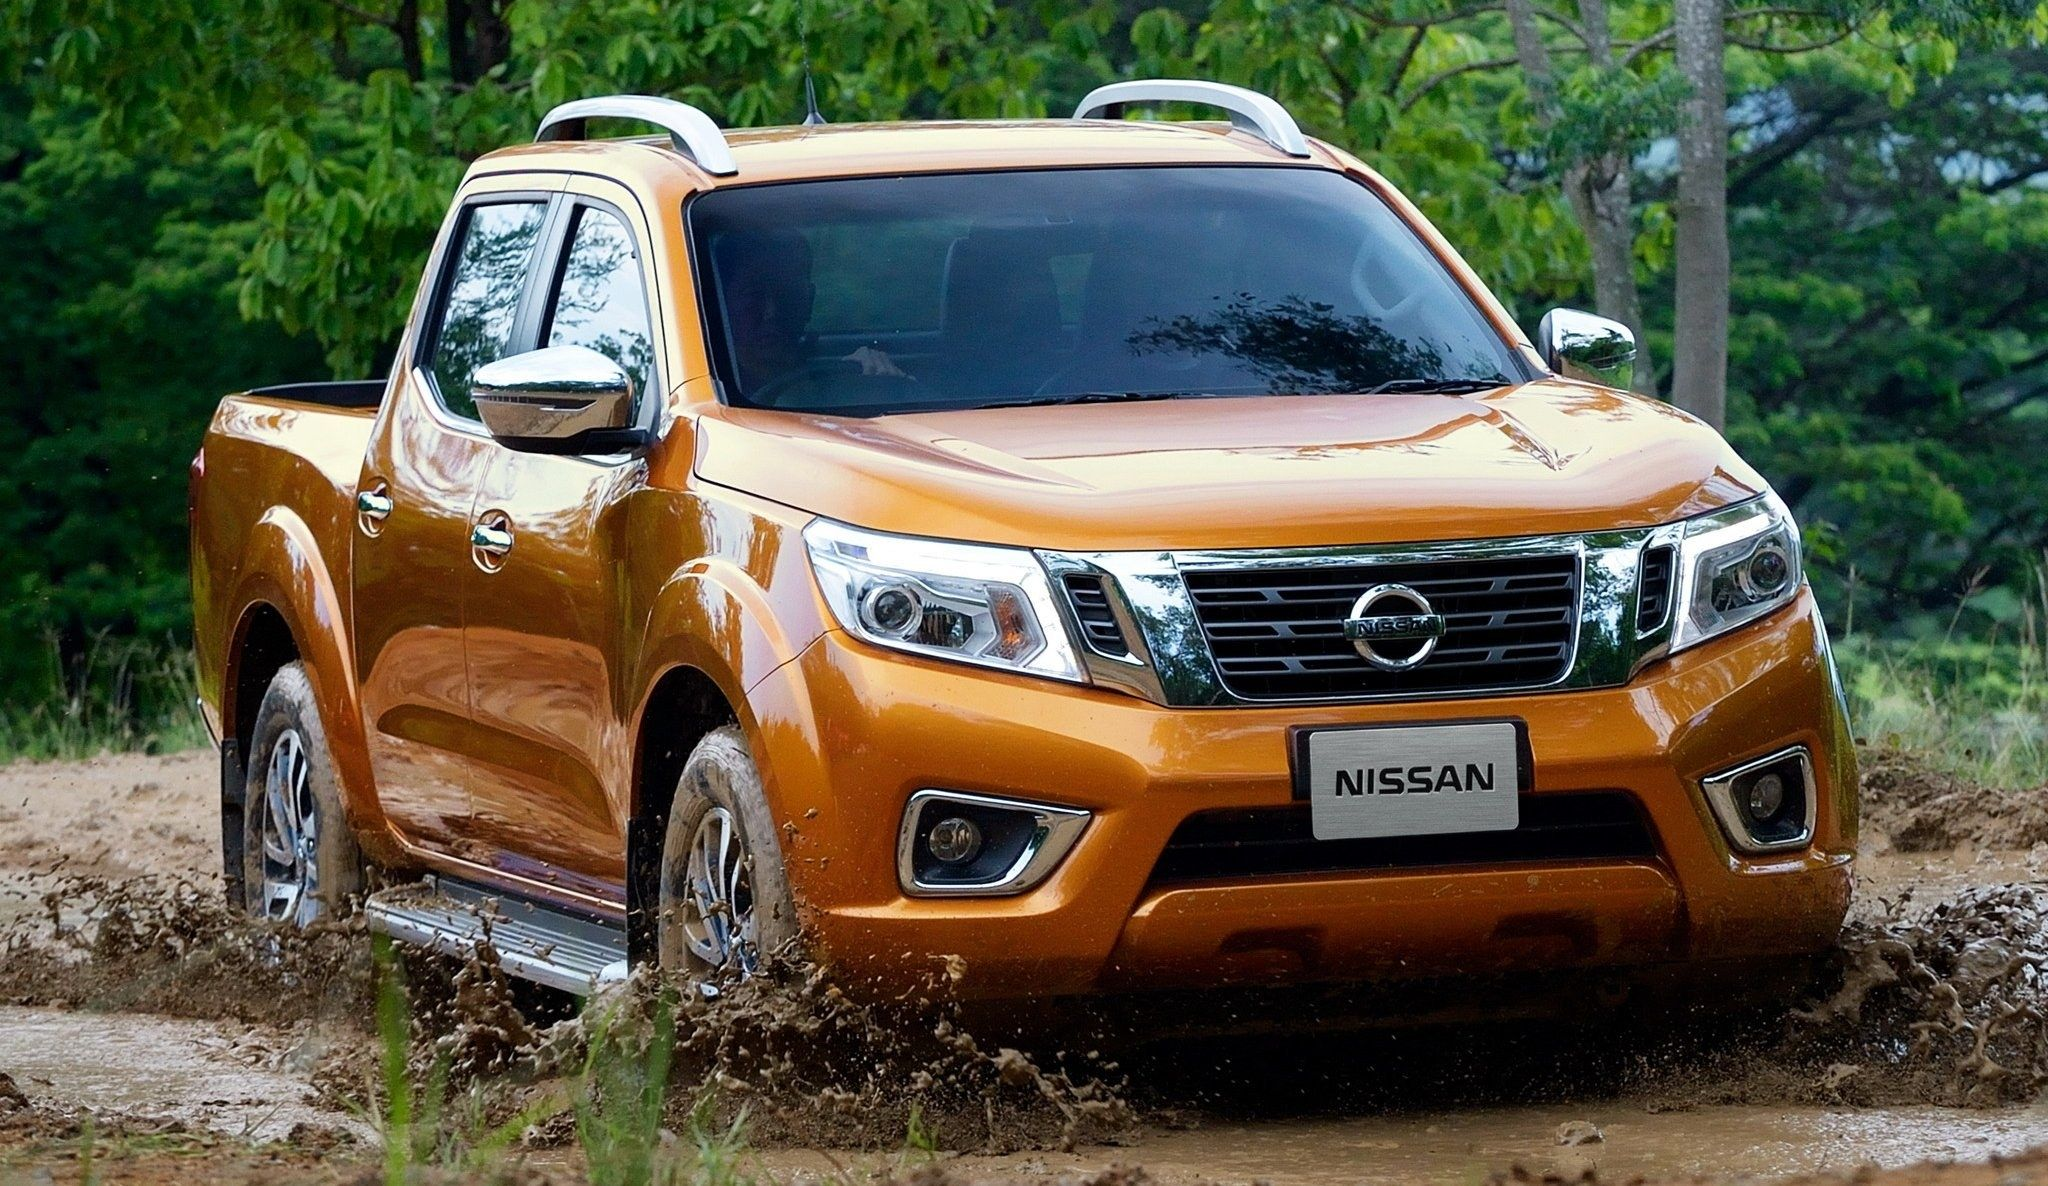 Nissan Navara 2019 Concept Nissan Navara Nissan Frontier Nissan Cars